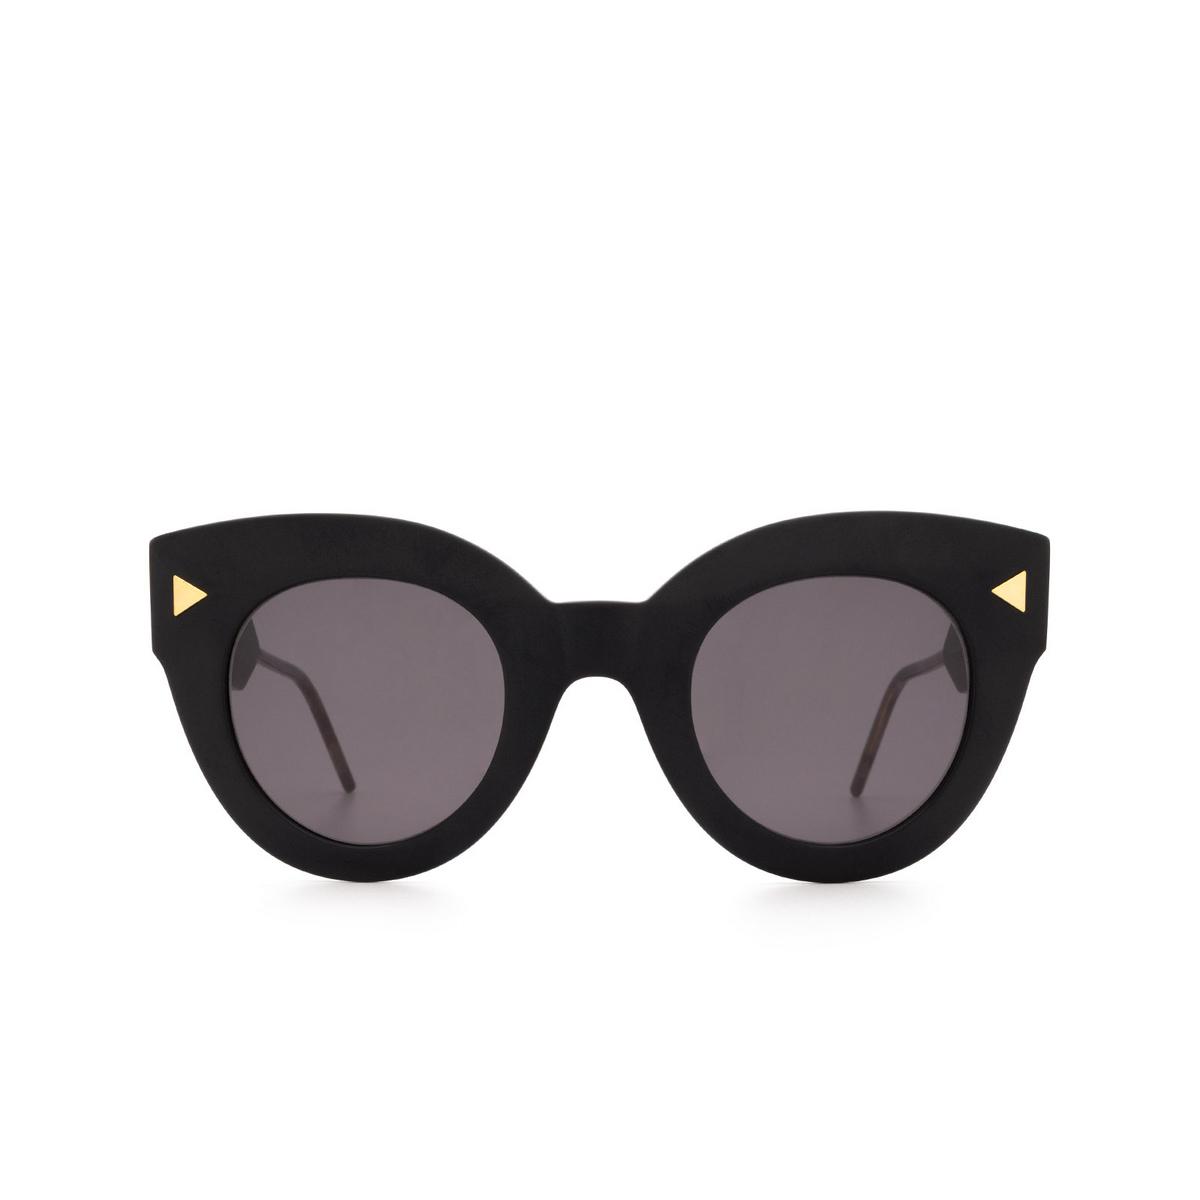 Soya® Cat-eye Sunglasses: Alma color Matte Black Bkm-fs - front view.